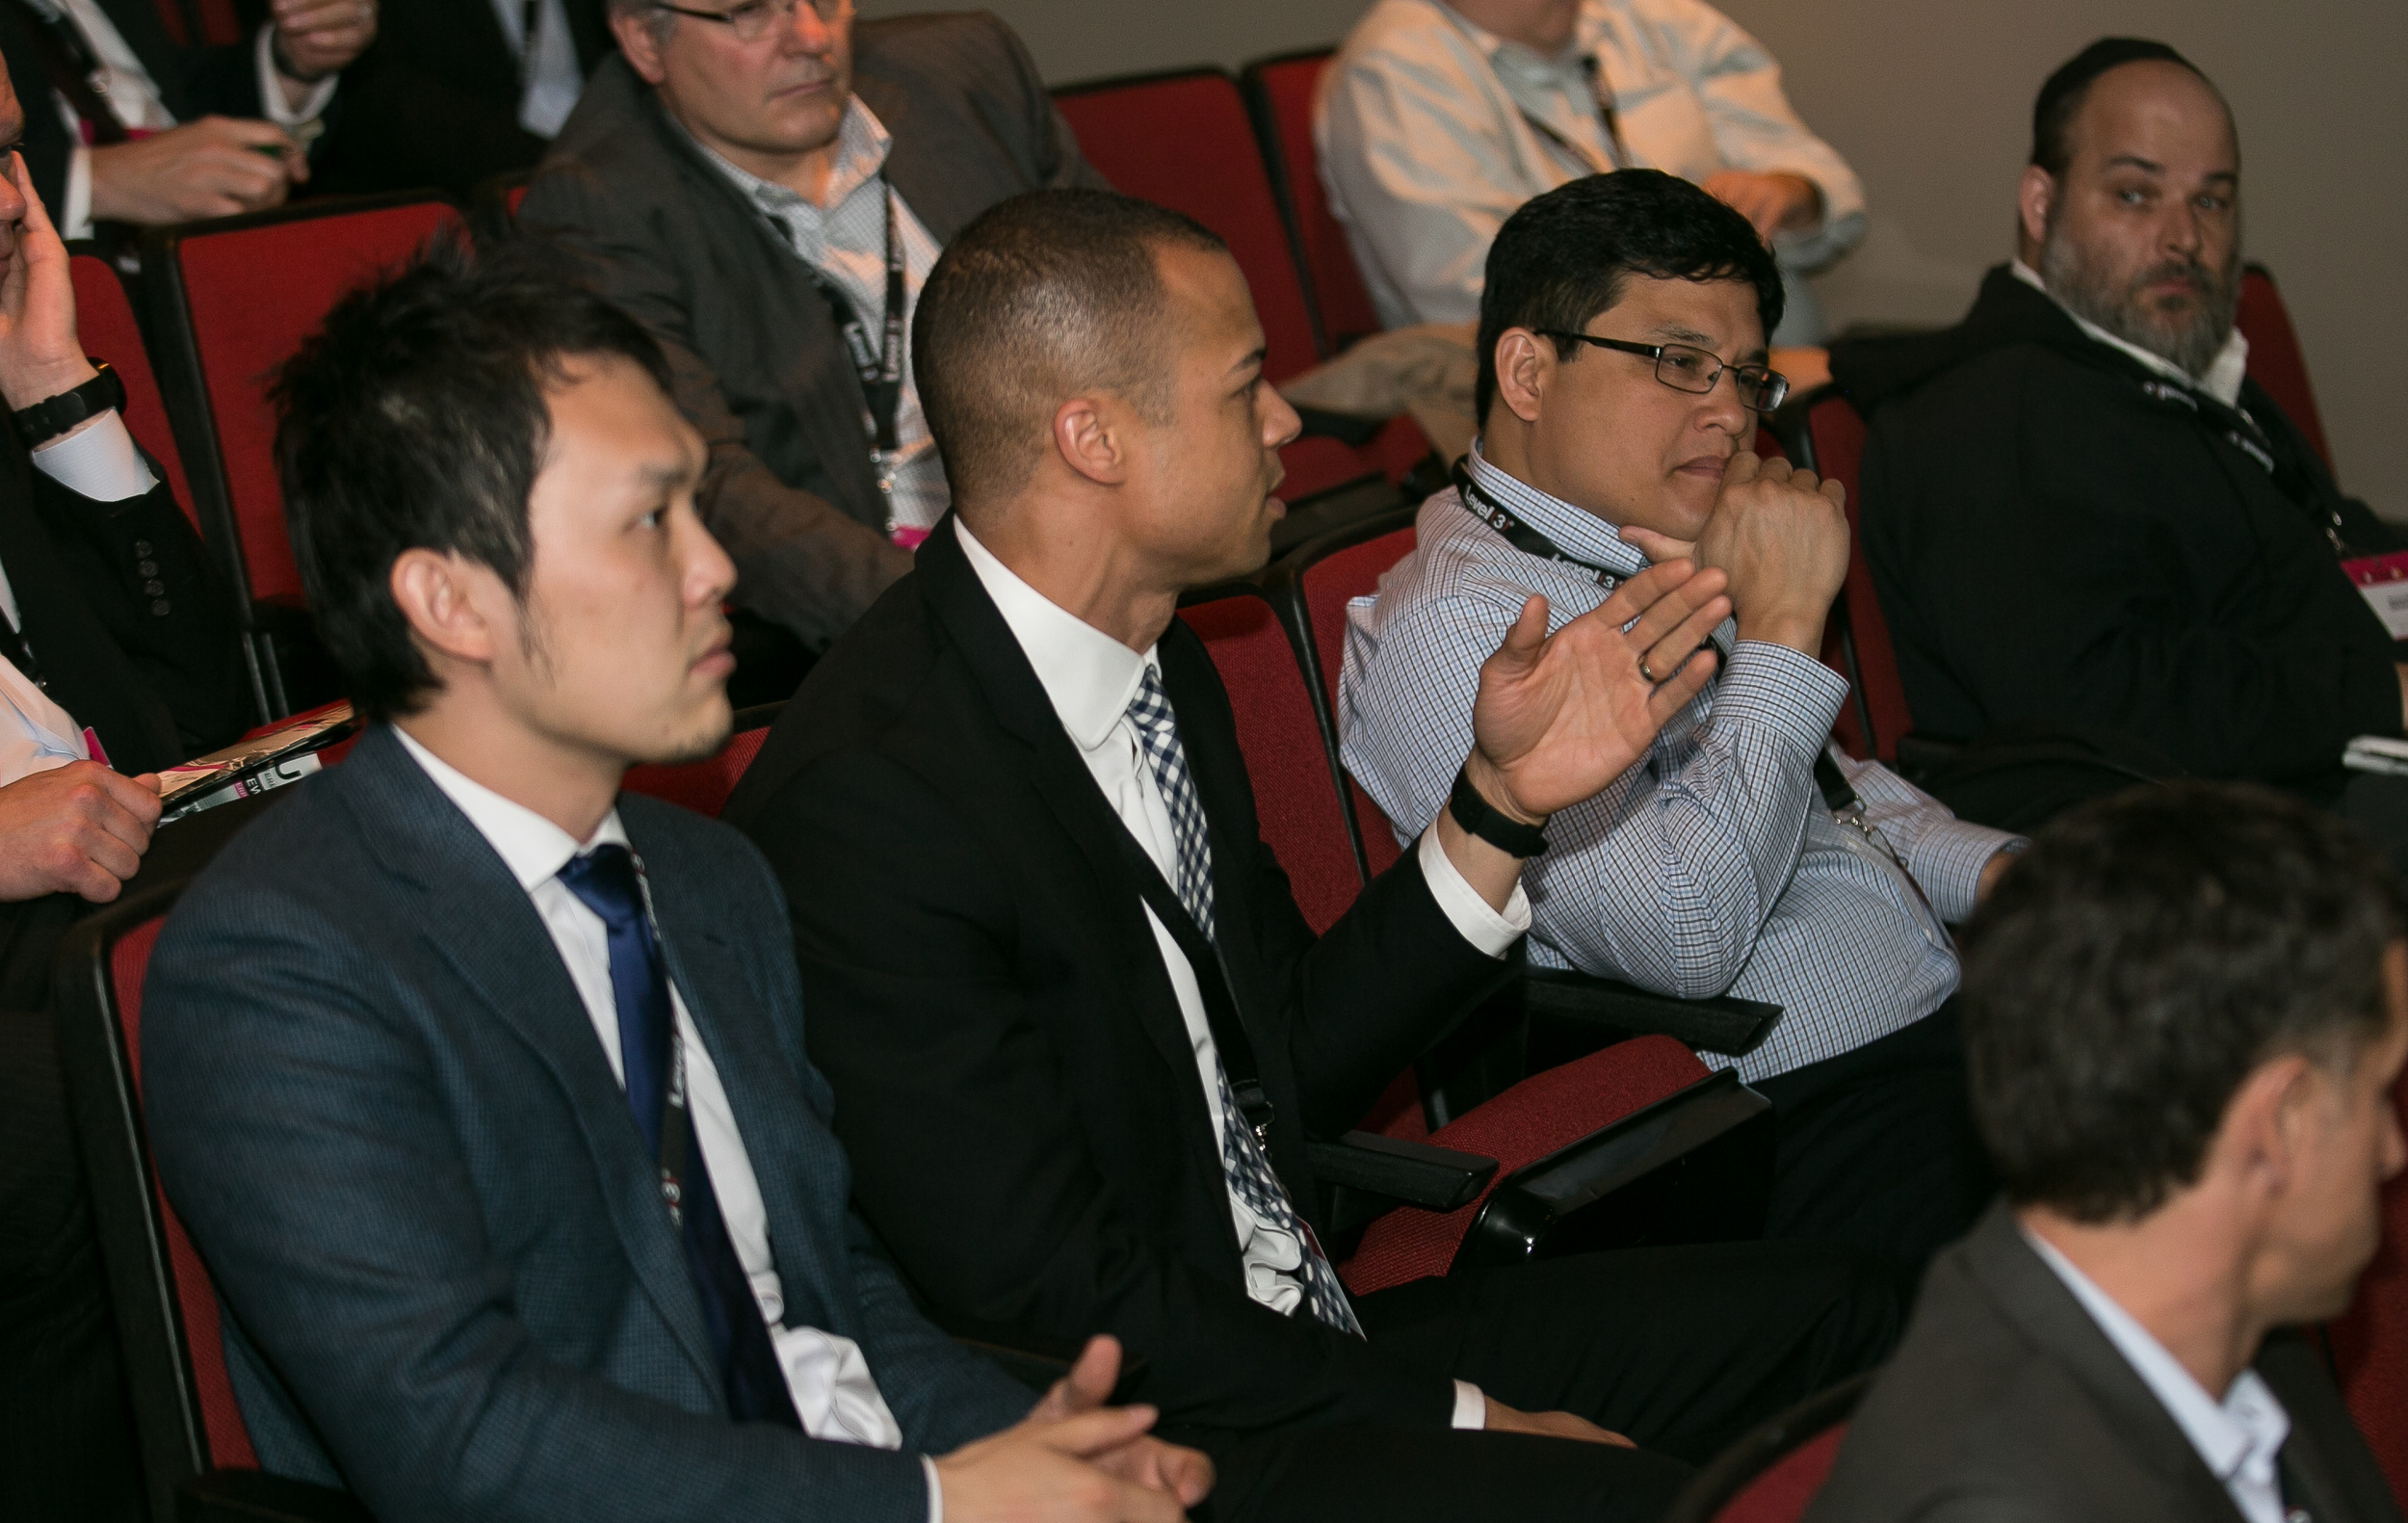 117-Capacity_Conferences-WAN_Summit-042715-6P9A0345.jpg